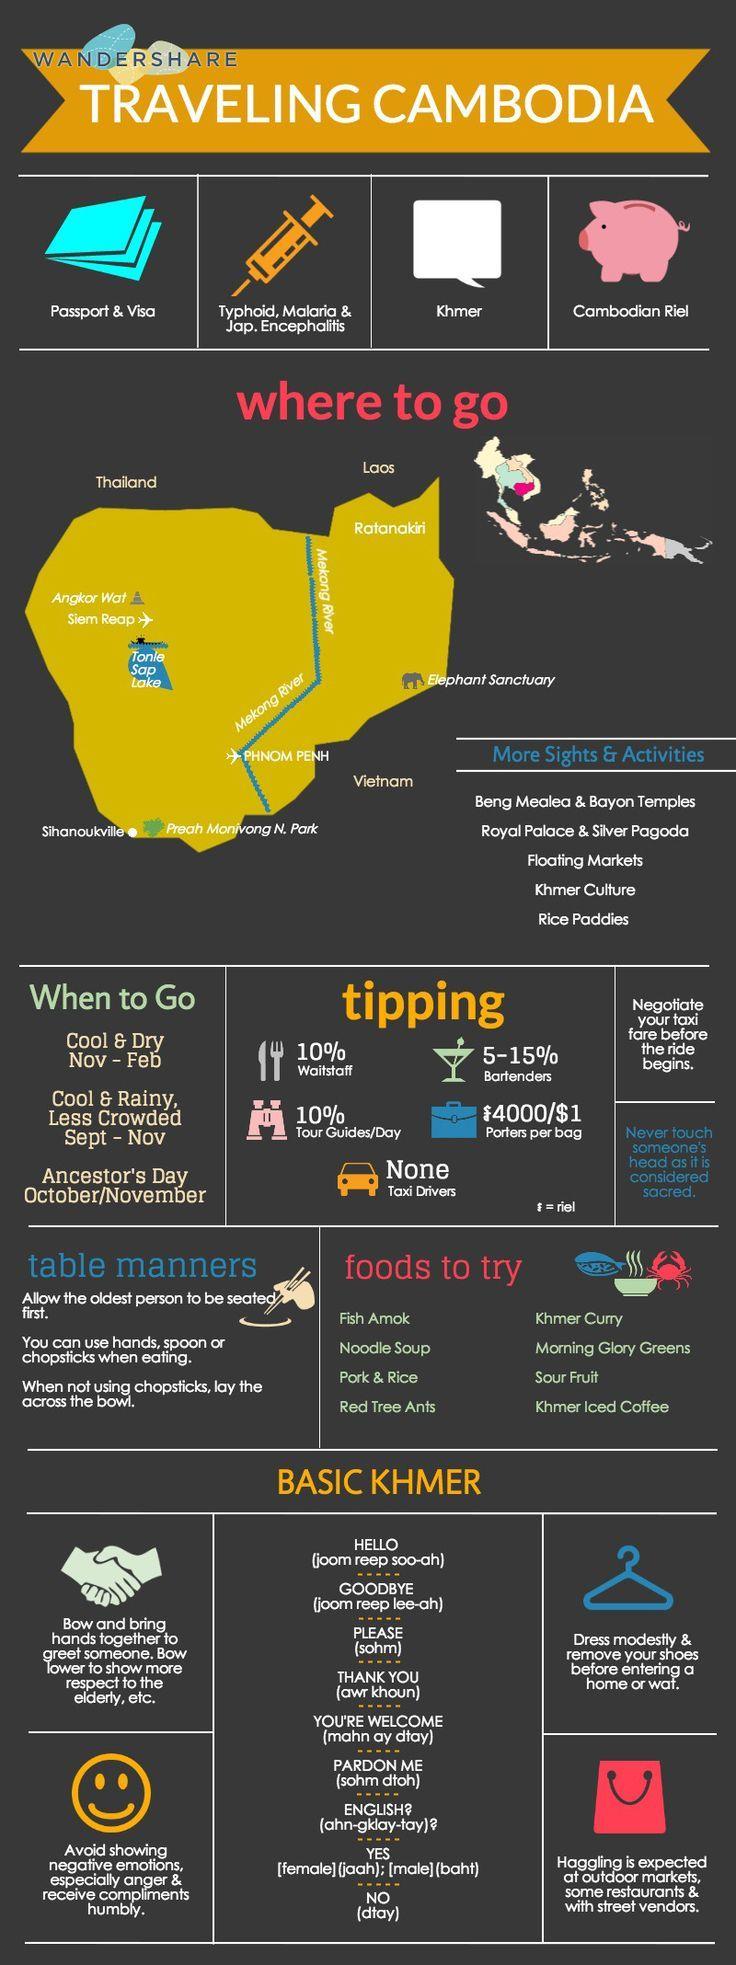 Tips for Traveling in Cambodia (scheduled via http://www.tailwindapp.com?utm_source=pinterest&utm_medium=twpin&utm_content=post872793&utm_campaign=scheduler_attribution)